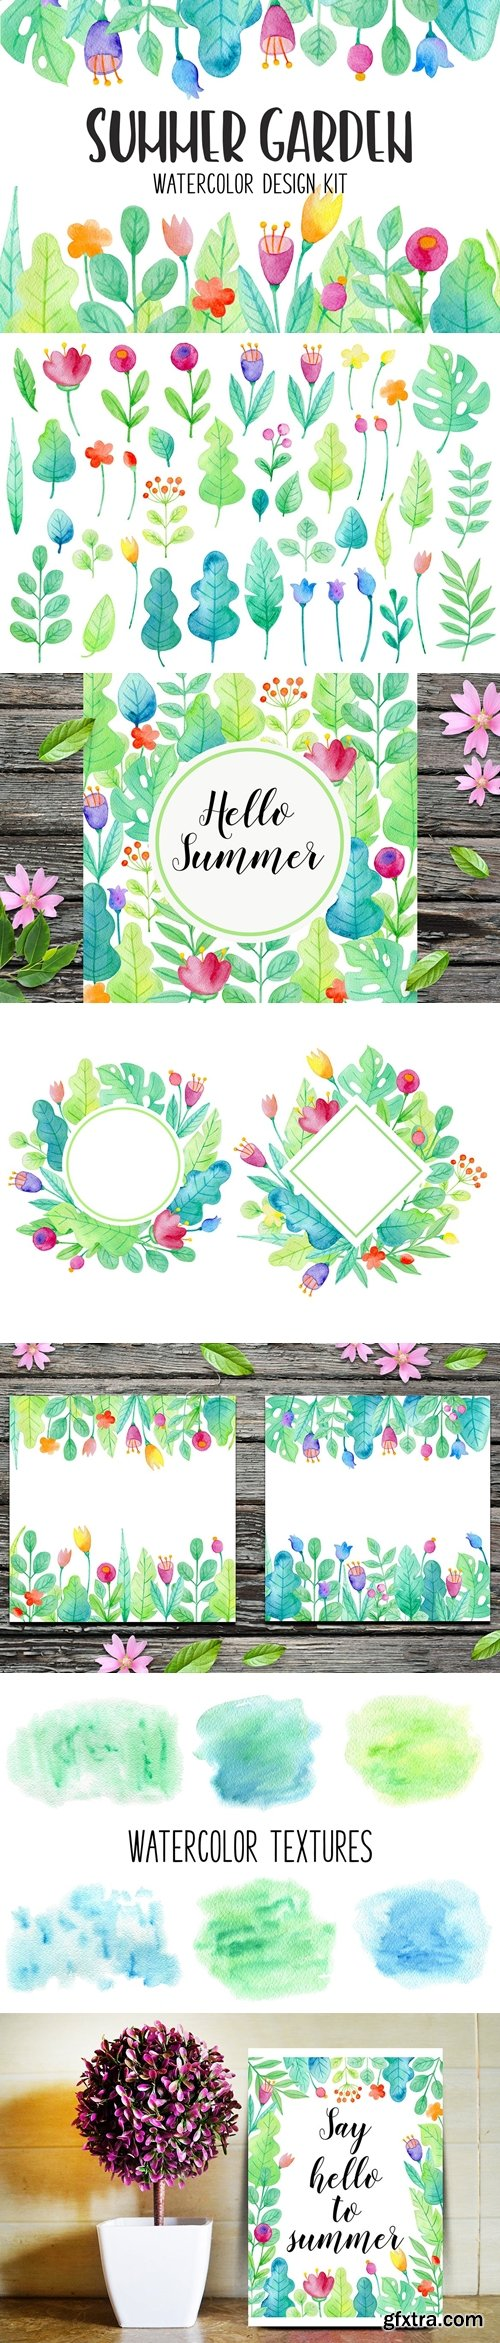 CM - Summer Garden Watercolor Design Kit 3852066